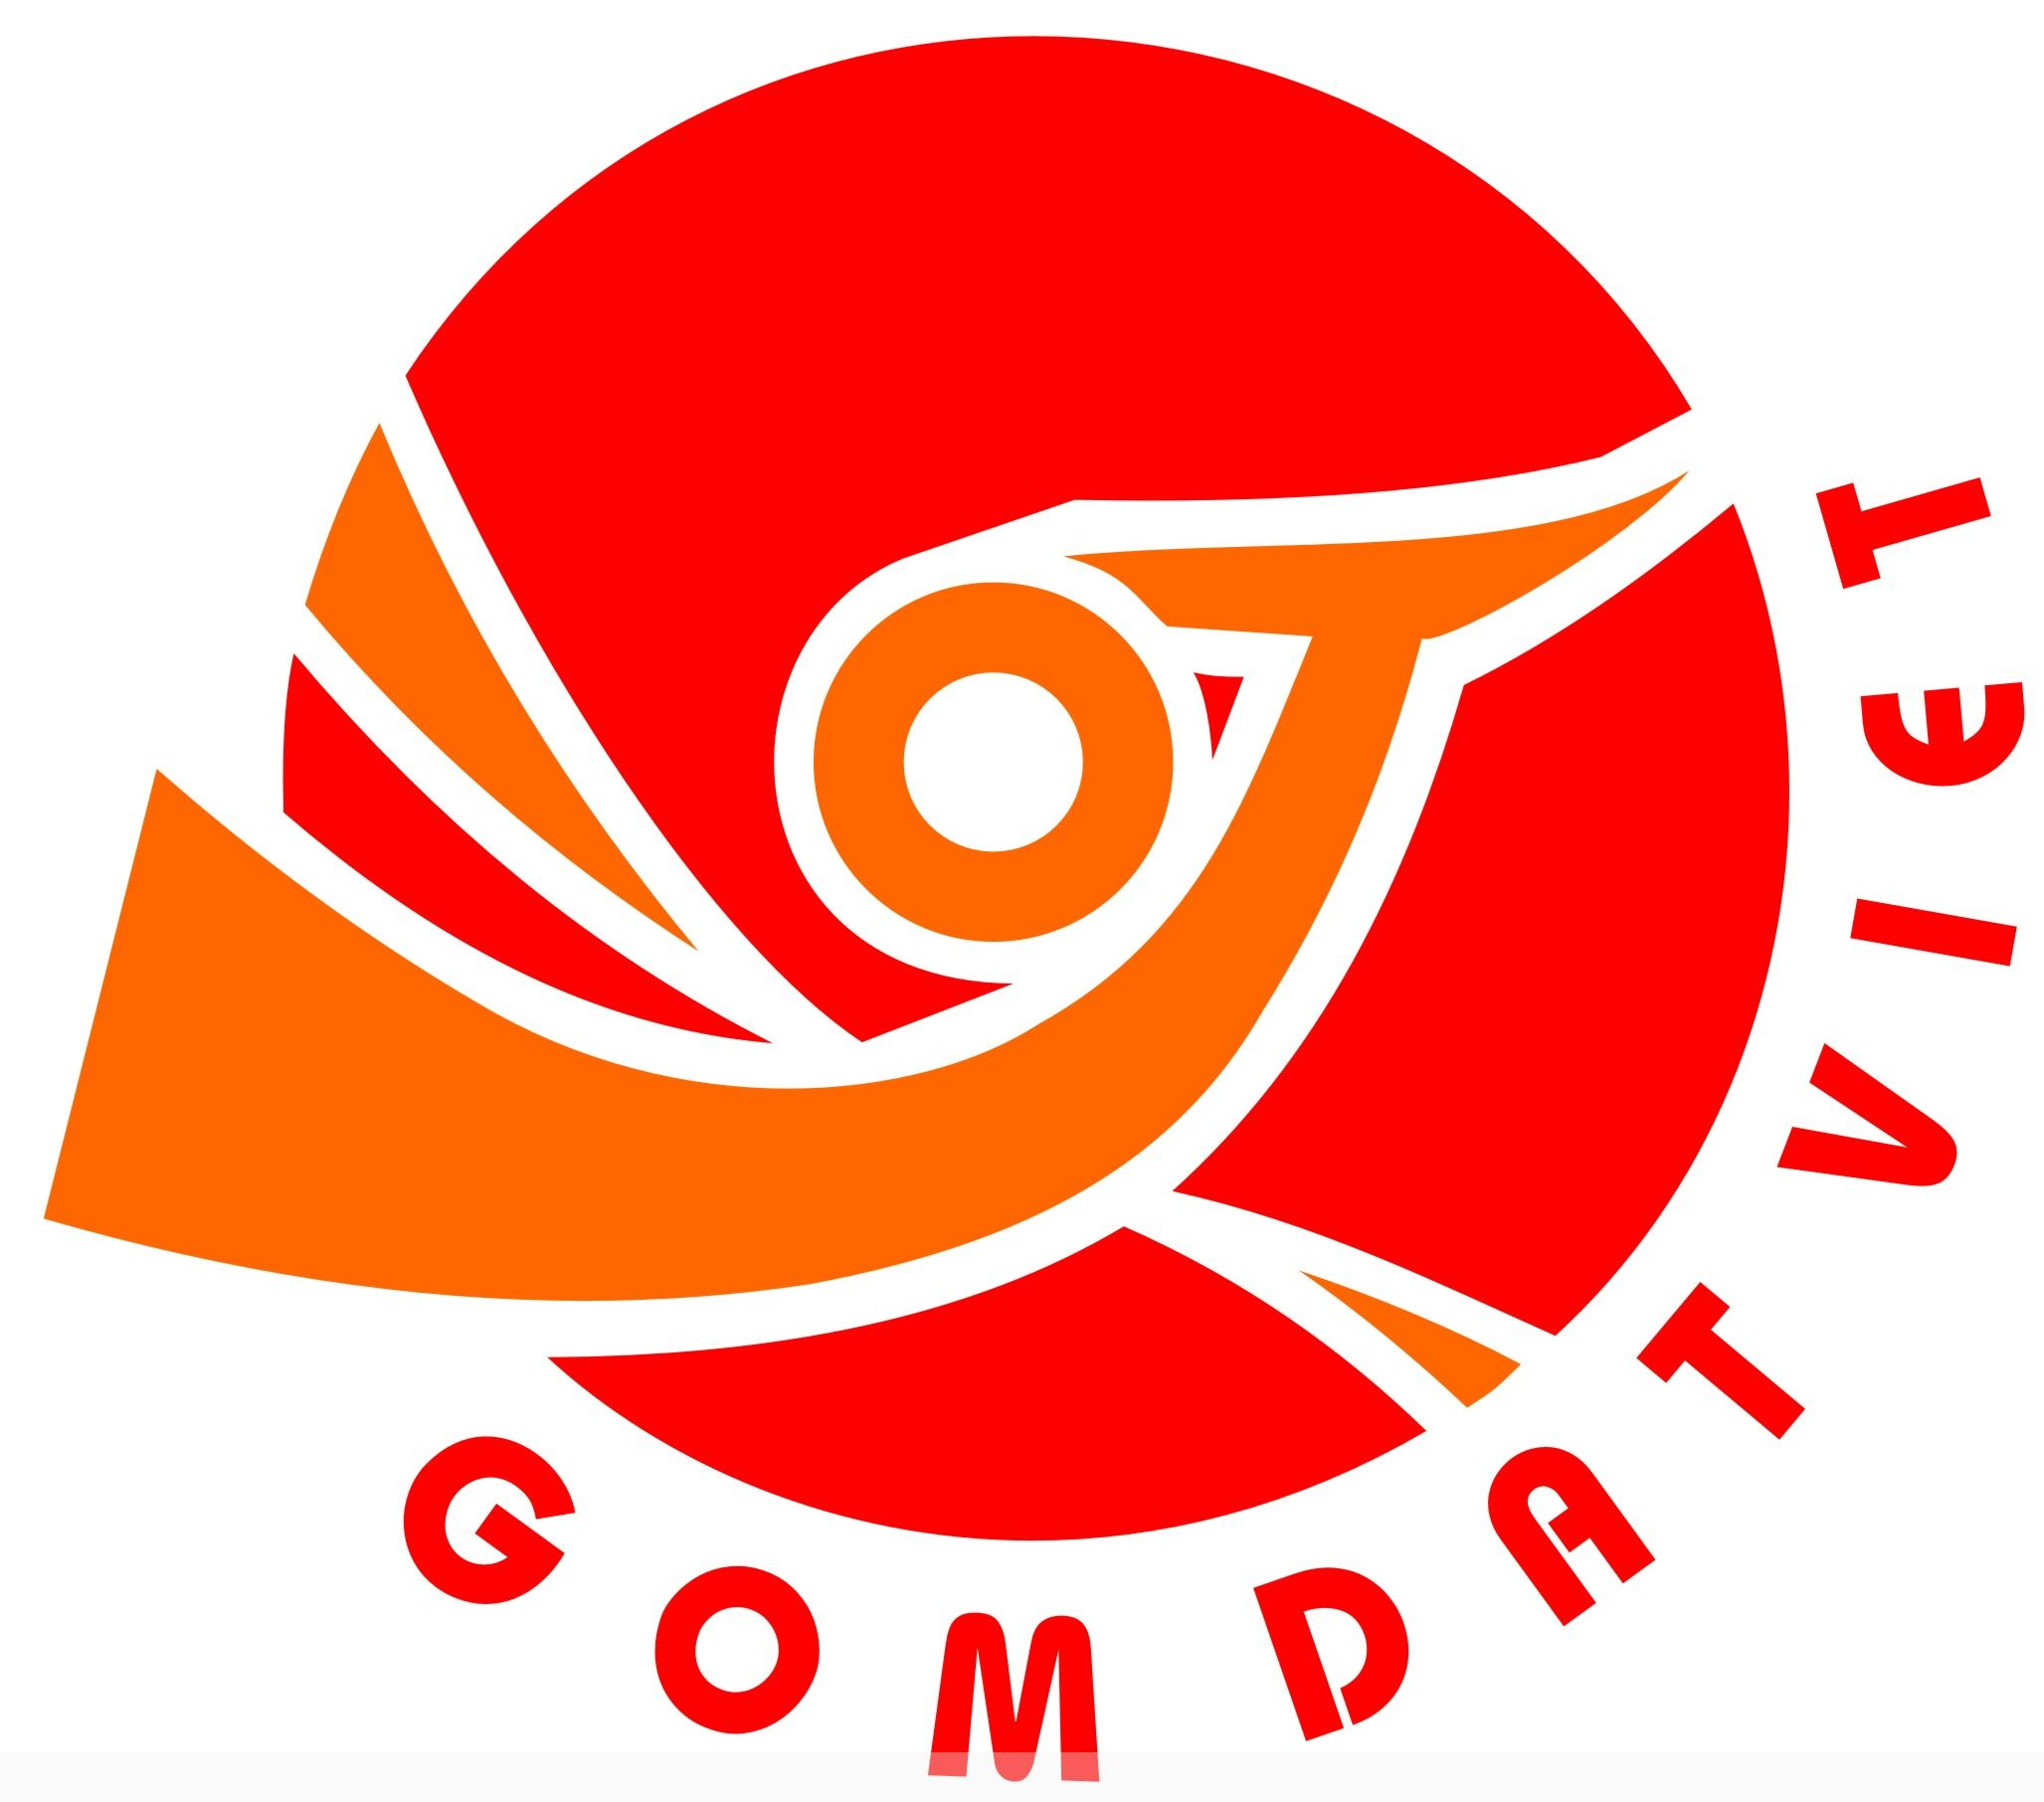 Vietnamese Terracotta joint stock company -   GhanaTrader.com : Buy ...